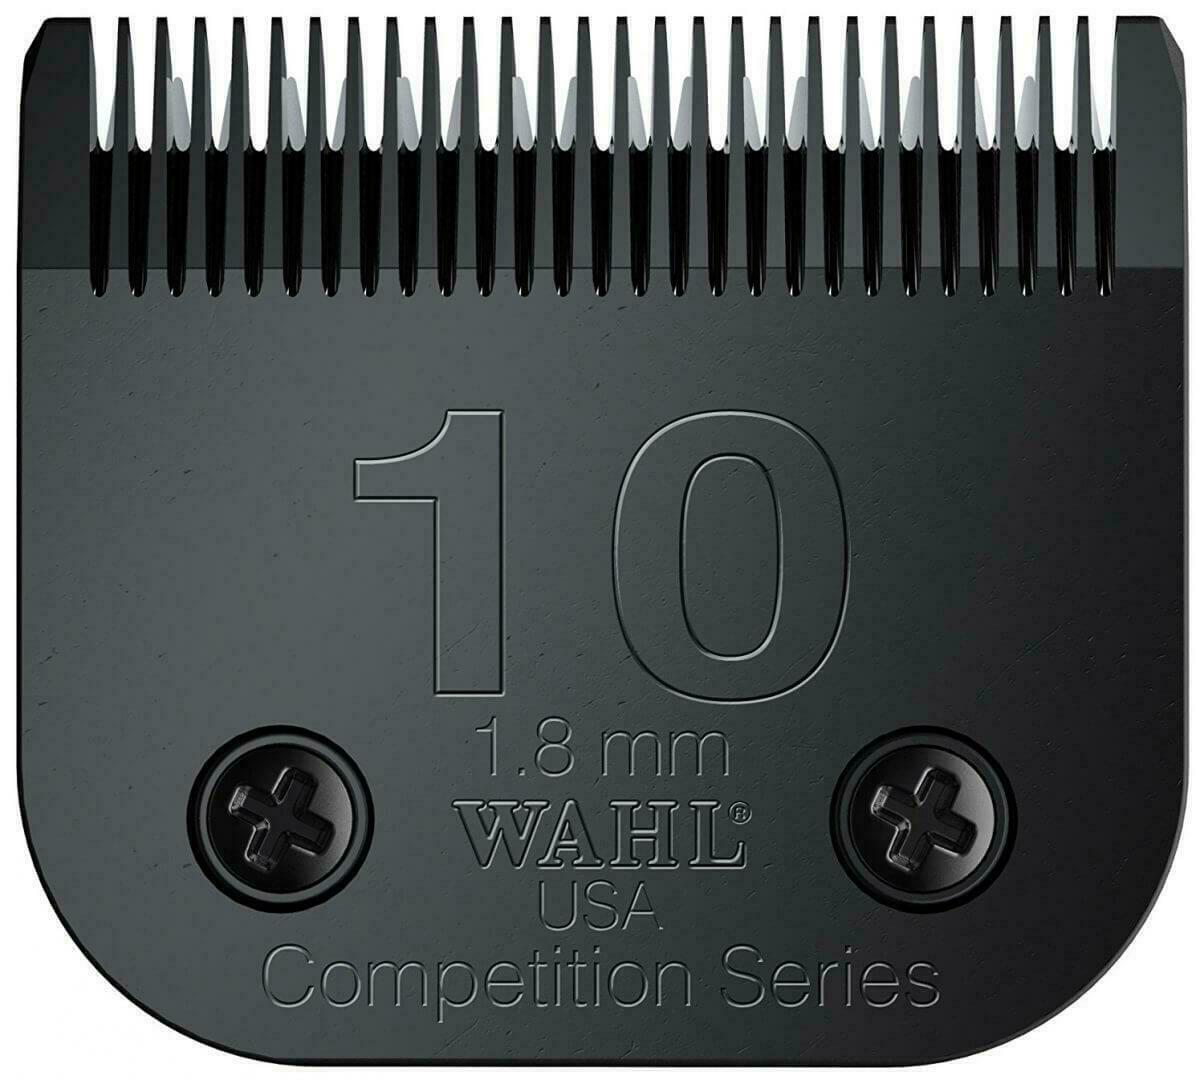 Ножевой блок для машинок Wahl Ultimate Competition, 1,8 мм